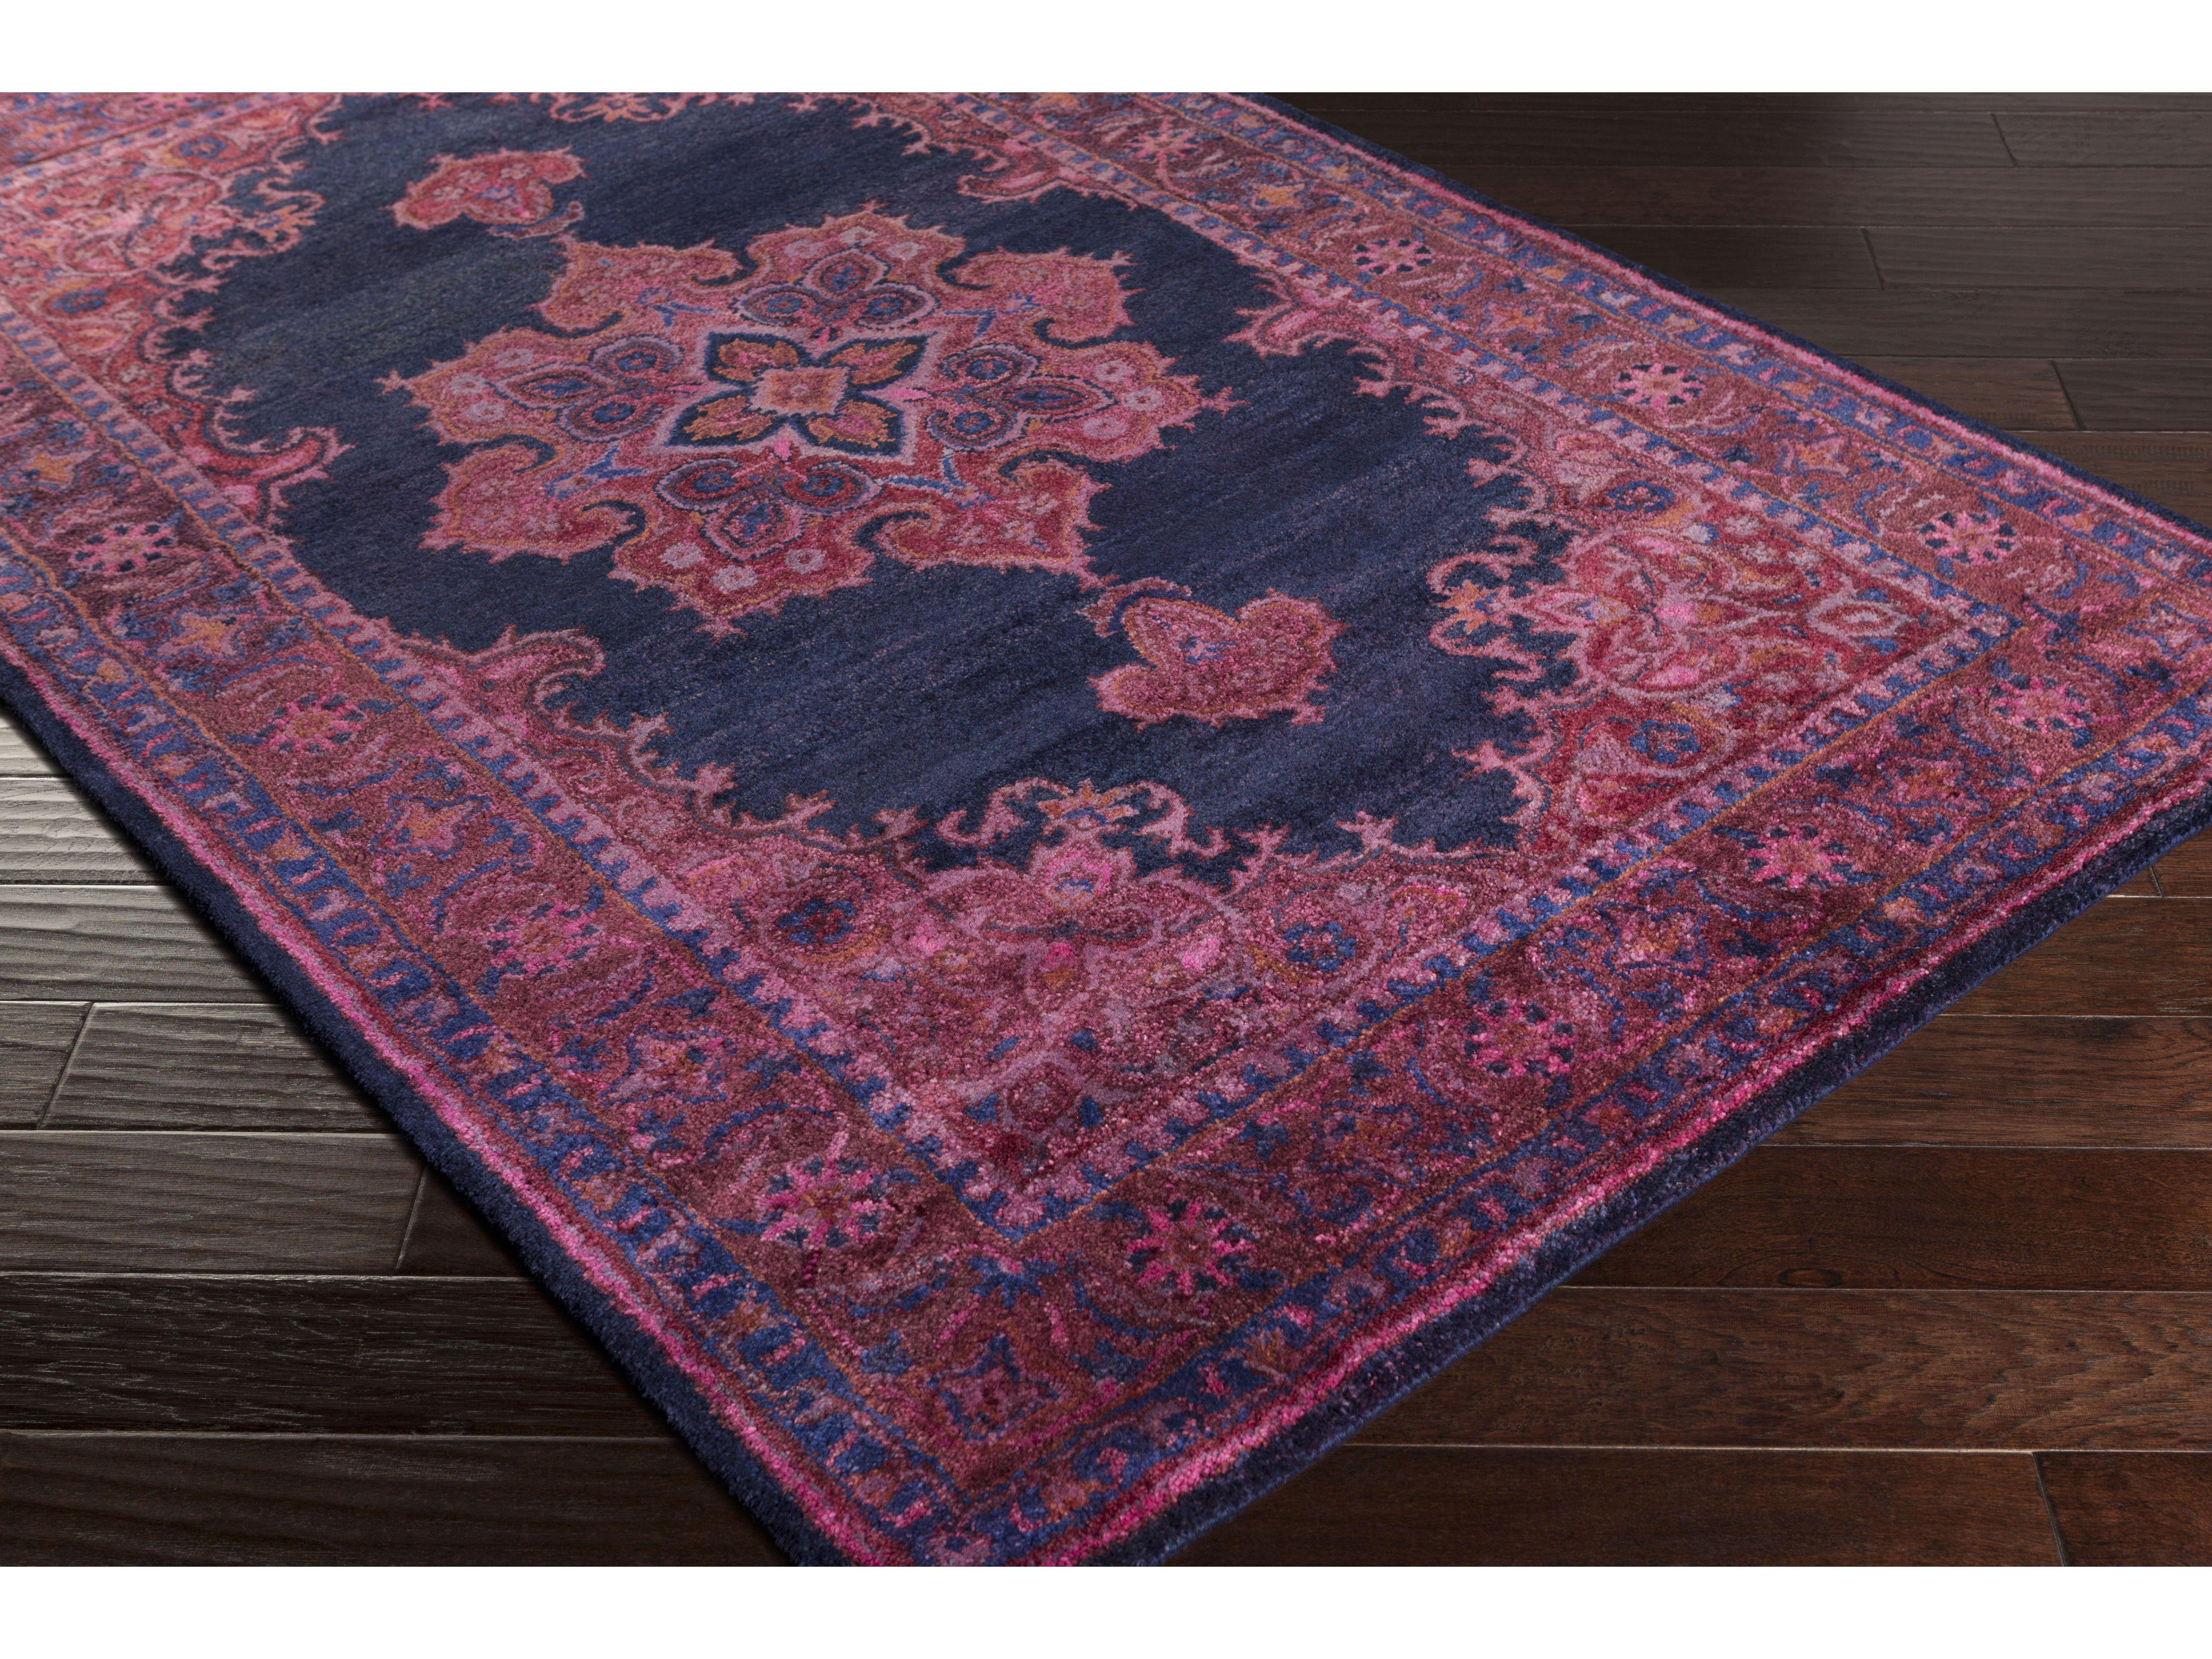 surya mykonos rectangular navy u0026 dark purple area rug